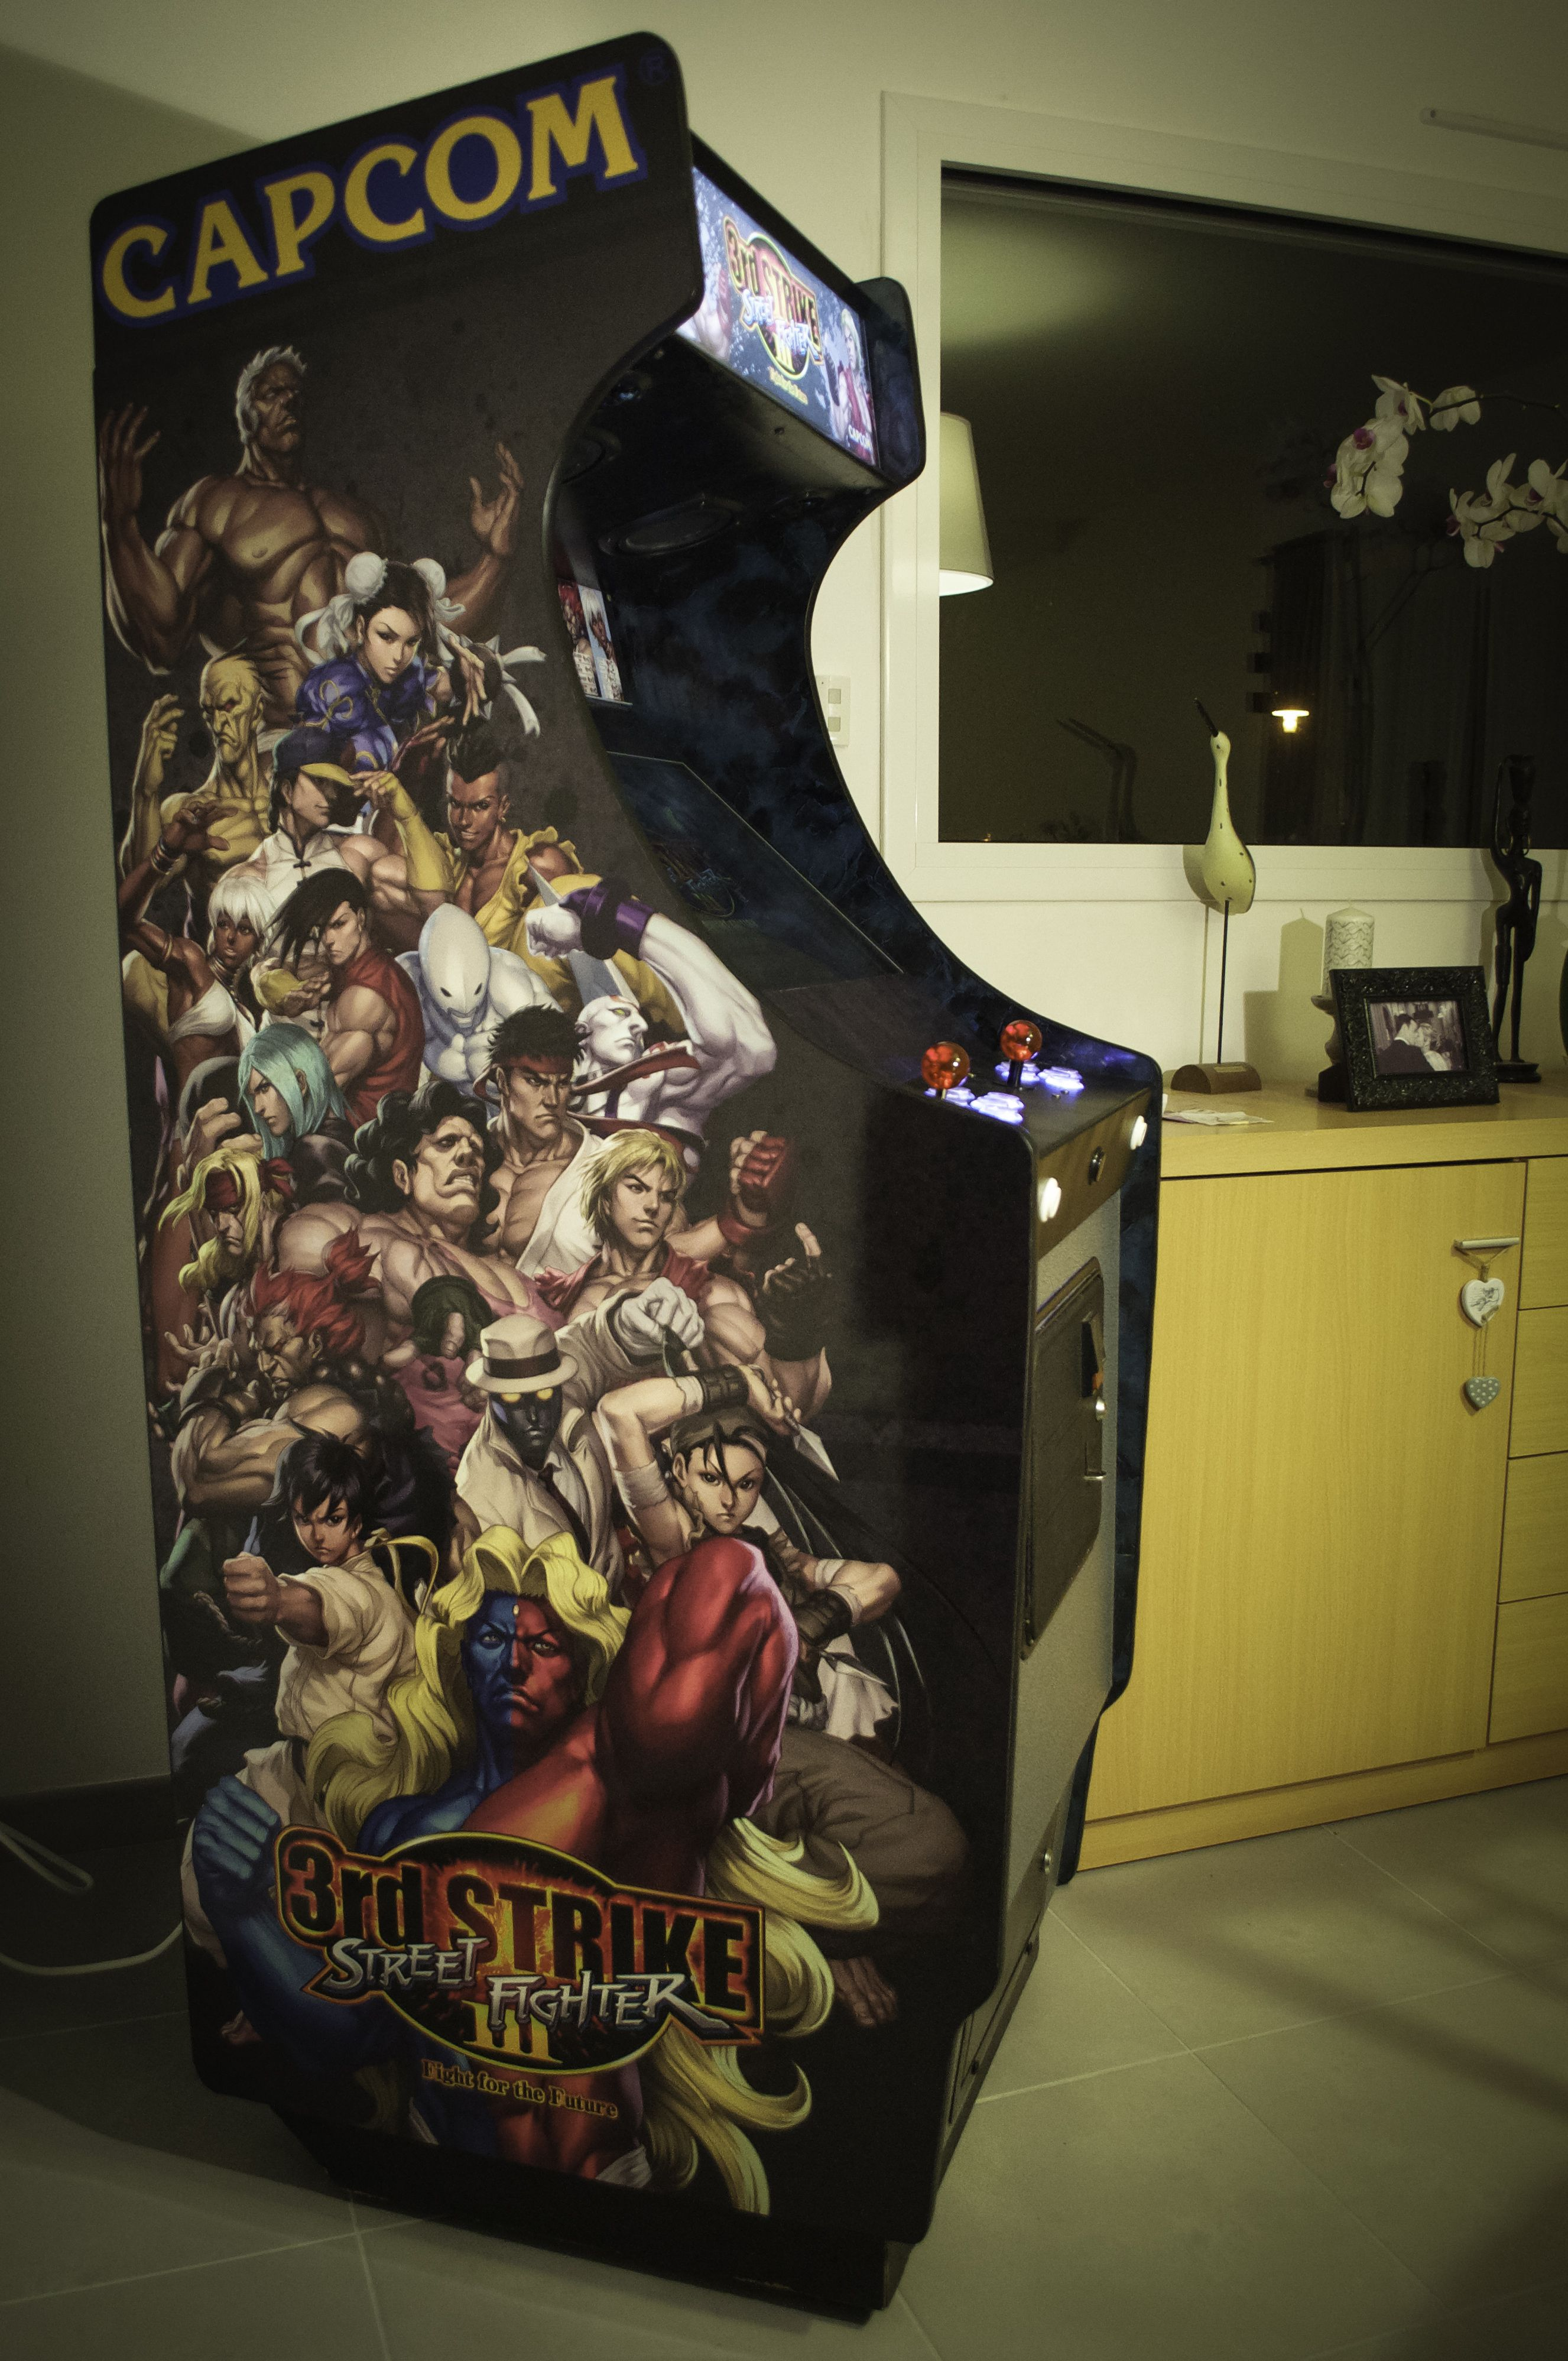 My Street Fighter III - 3rd Strike #Arcade Cabinet My gamer dream